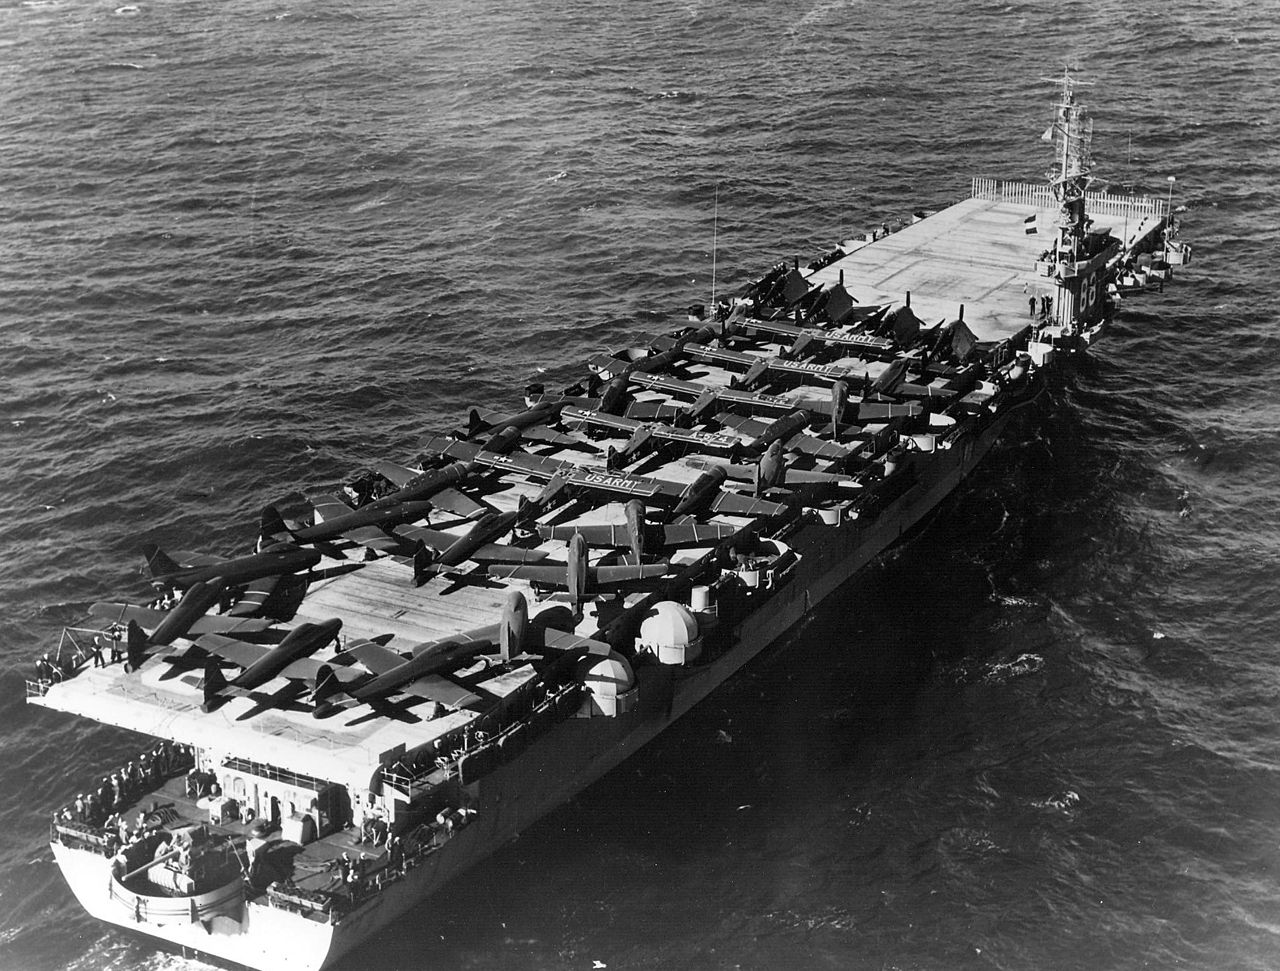 1280px-USS_Cape_Esperance_(CVE-88)_trans